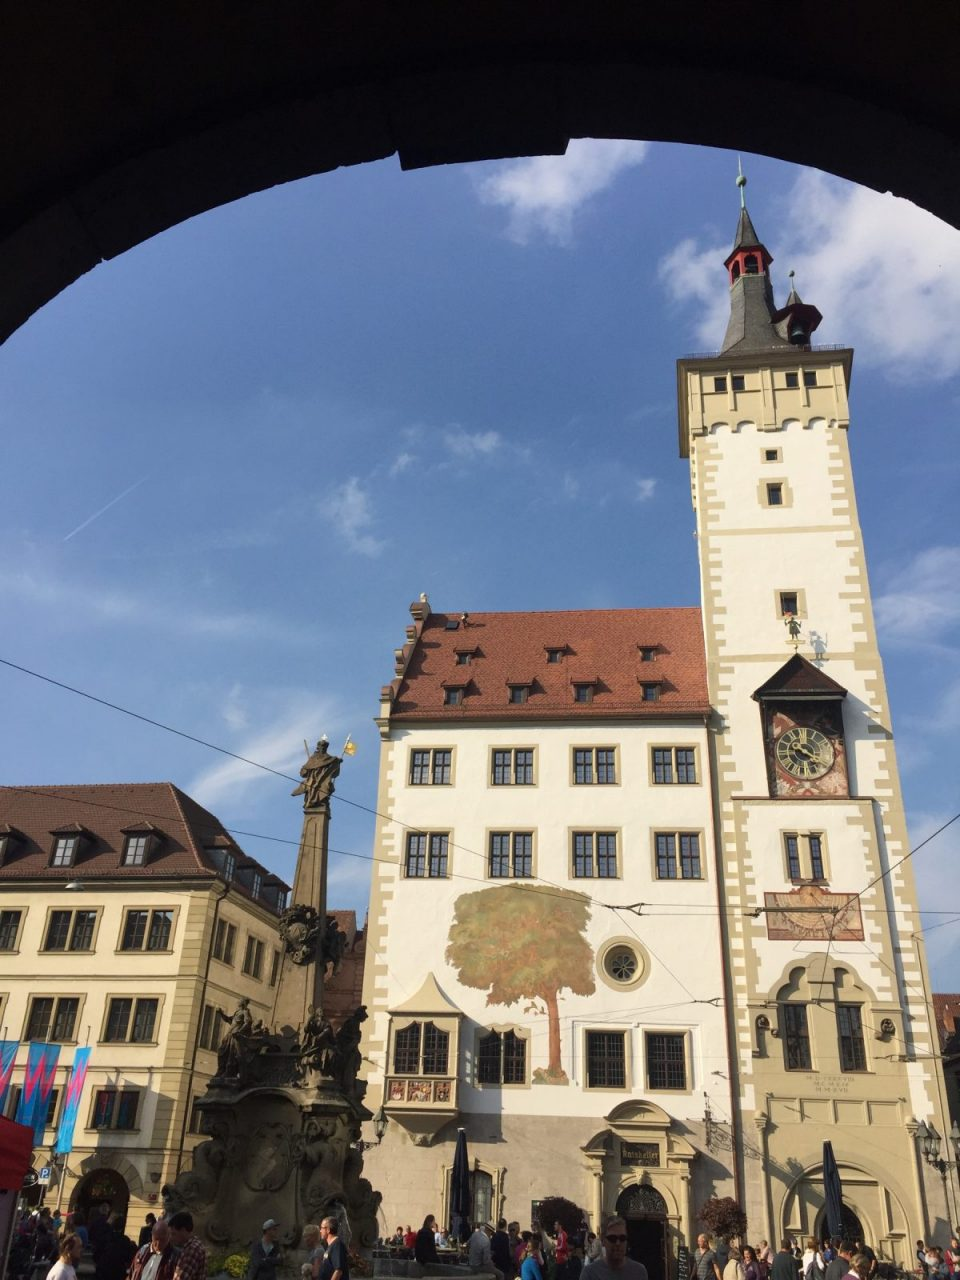 Wuerzburg Rathaus. City hall